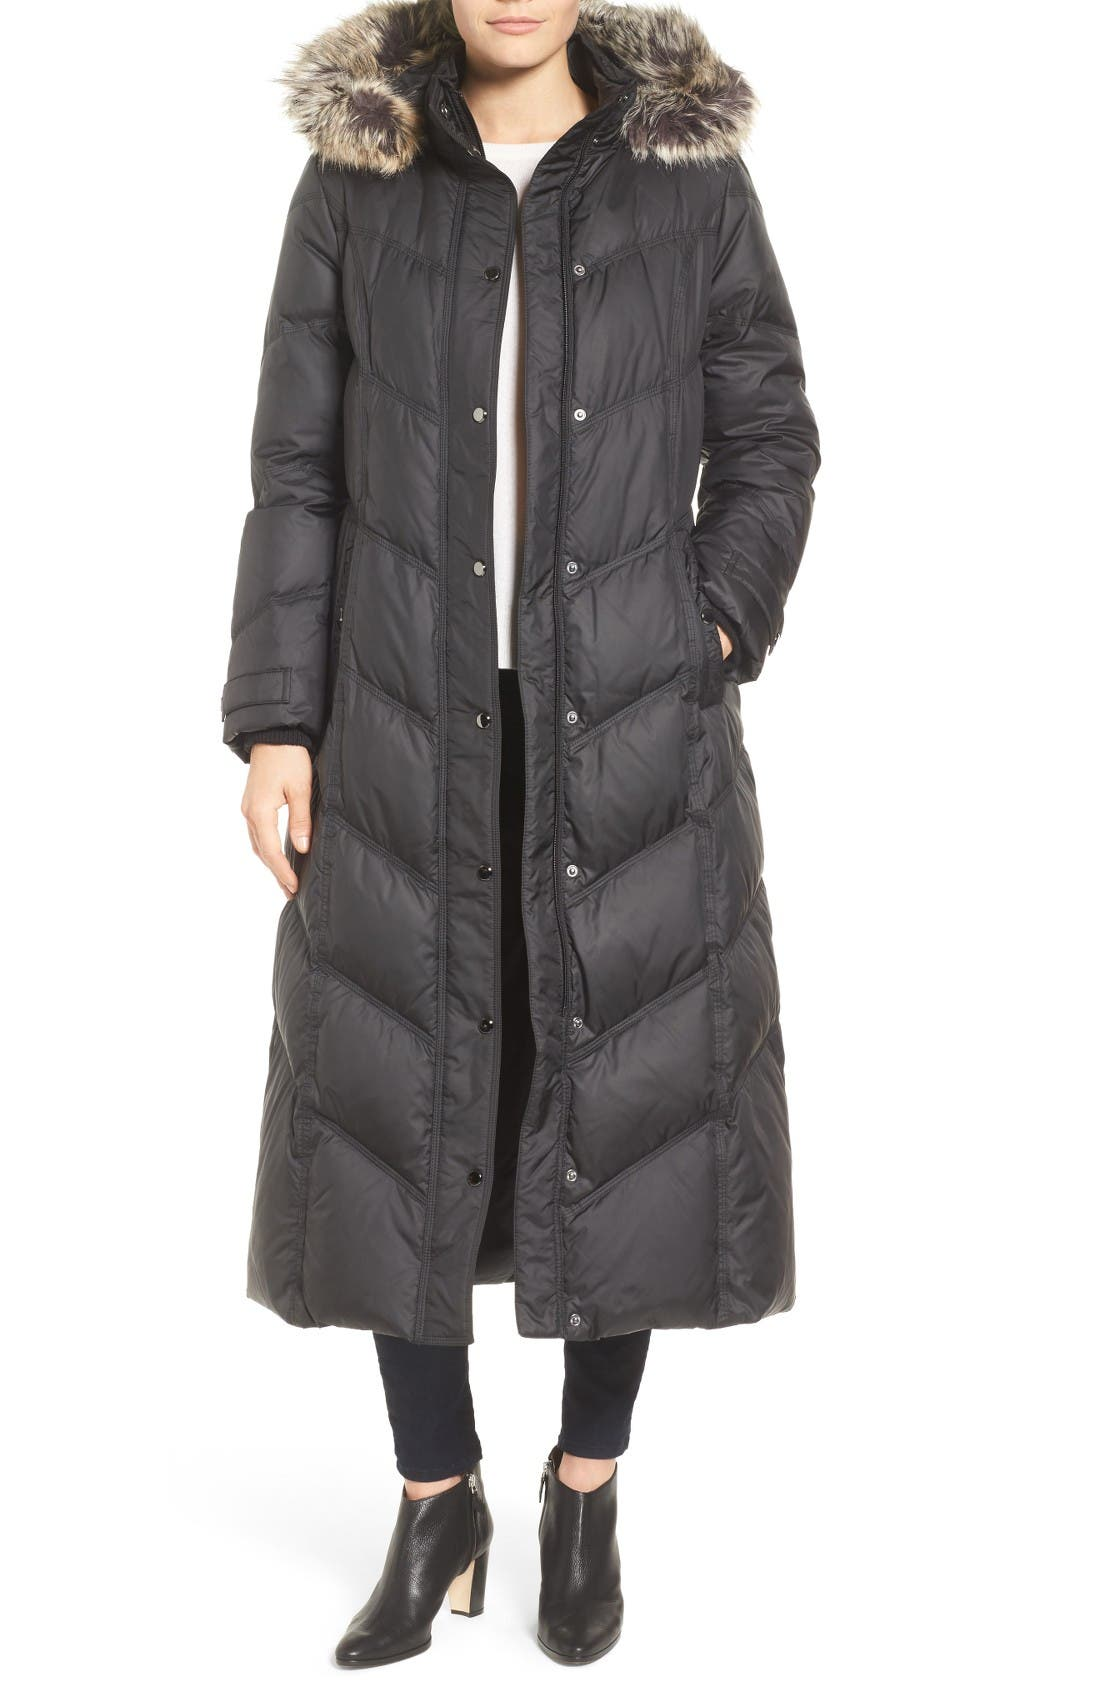 Alternate Image 1 Selected - London Fog Faux Fur Trim Quilted Maxi Coat